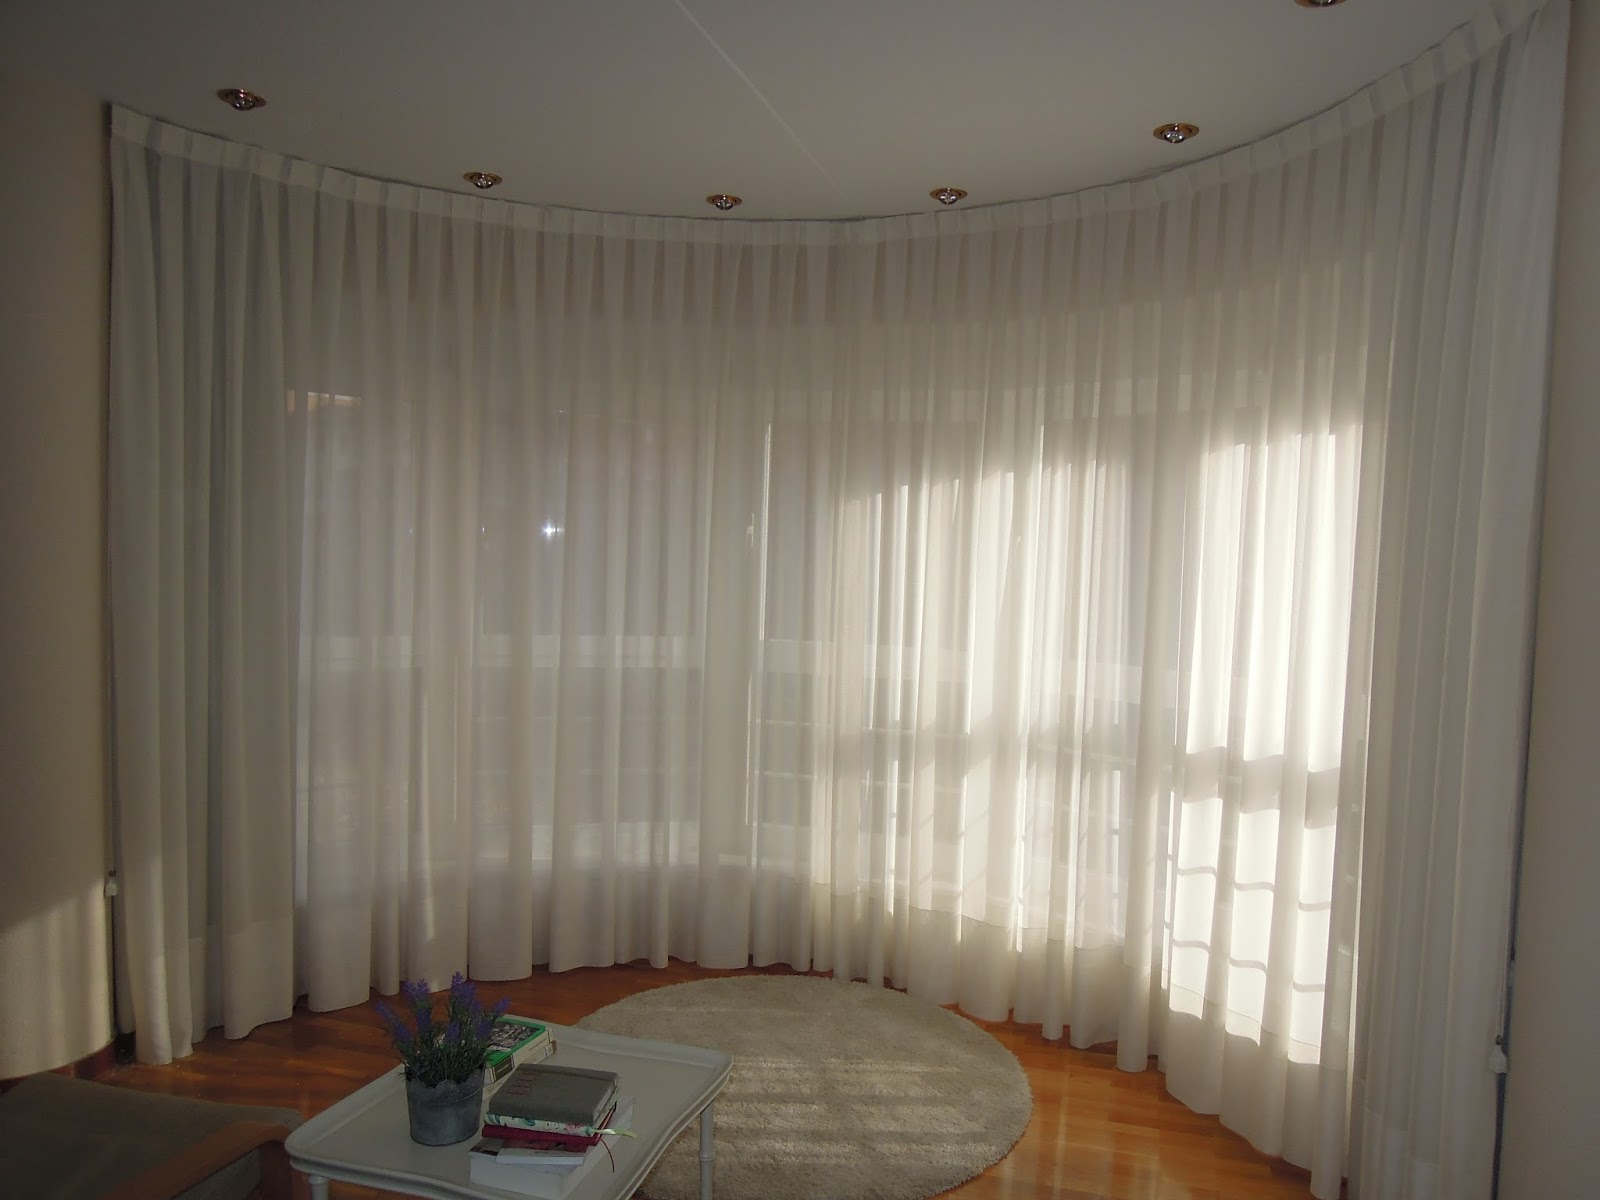 Fotos como elegir unas cortinas aqui os ense o - Como elegir cortinas ...